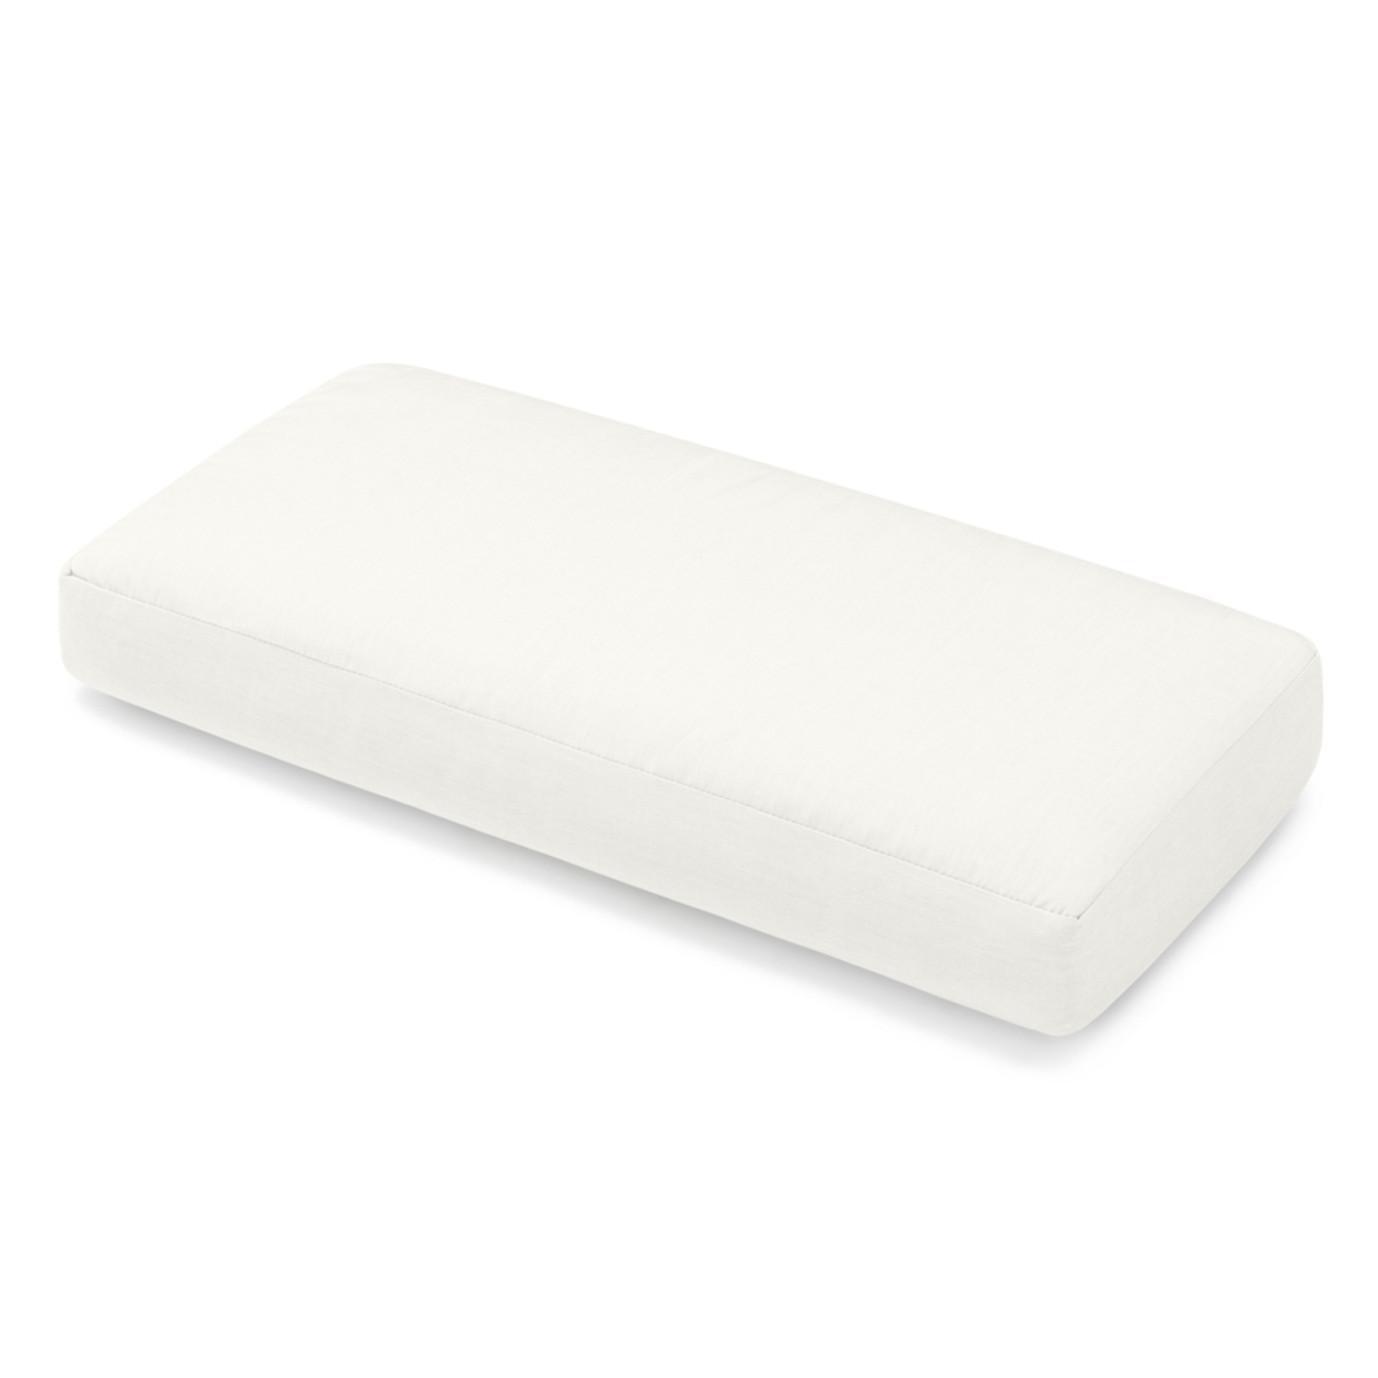 Vistano® 76in Sofa Back Cushion - Flax